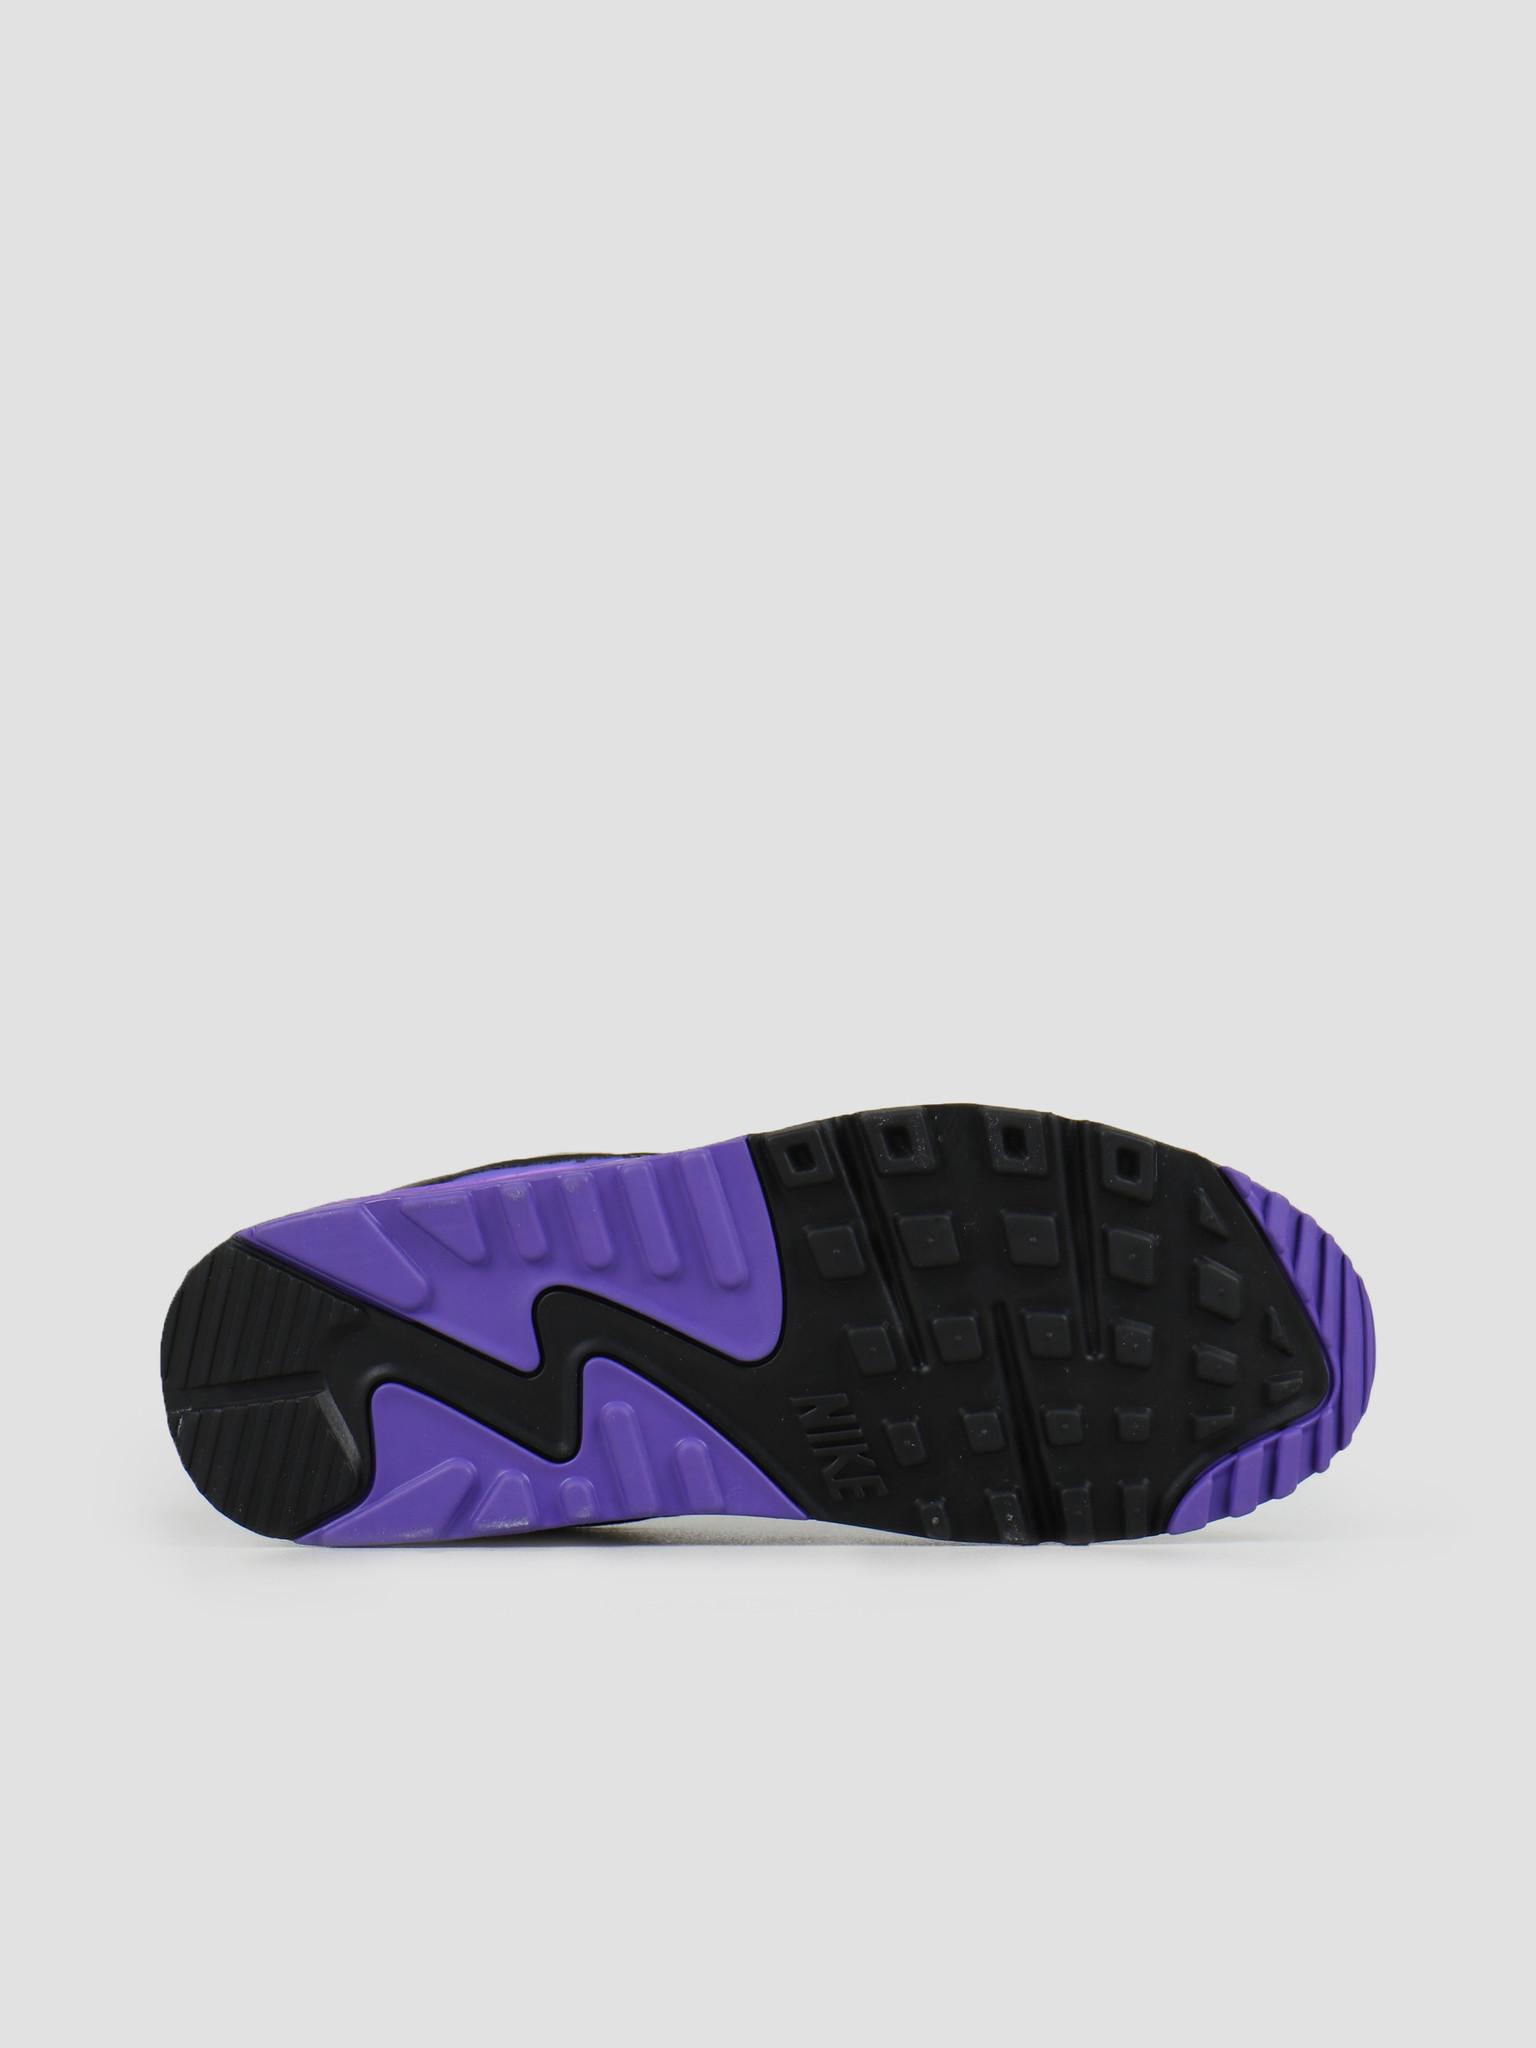 Nike Nike Air Max 90 White Particle Grey Hyper Grape Black CD0881-104